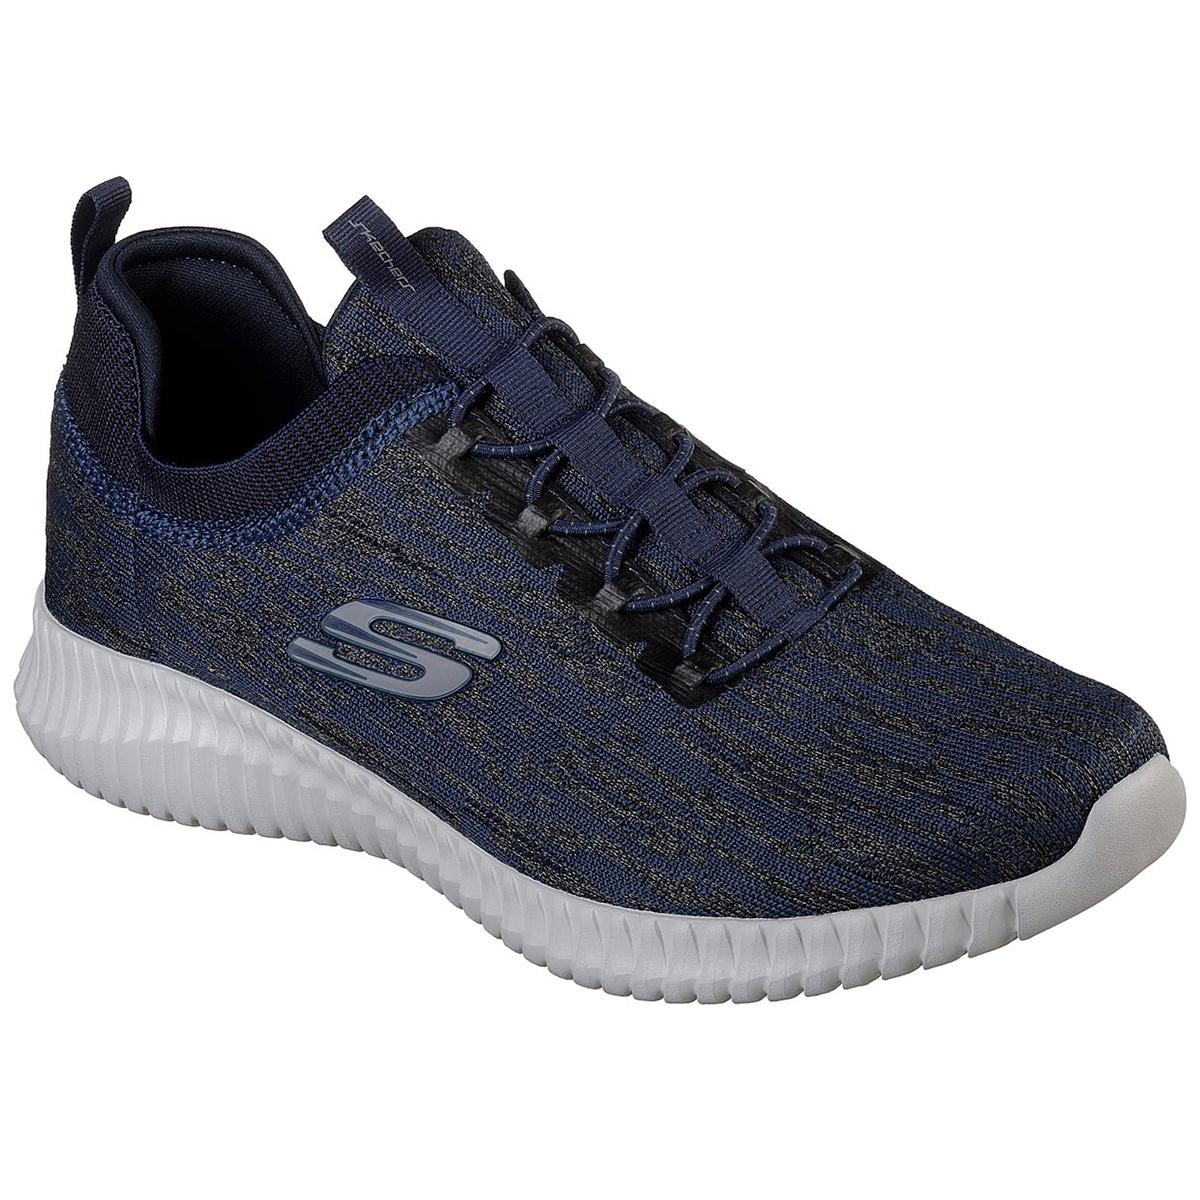 Skechers Men's Elite Flex Hartnell - Blue, 12